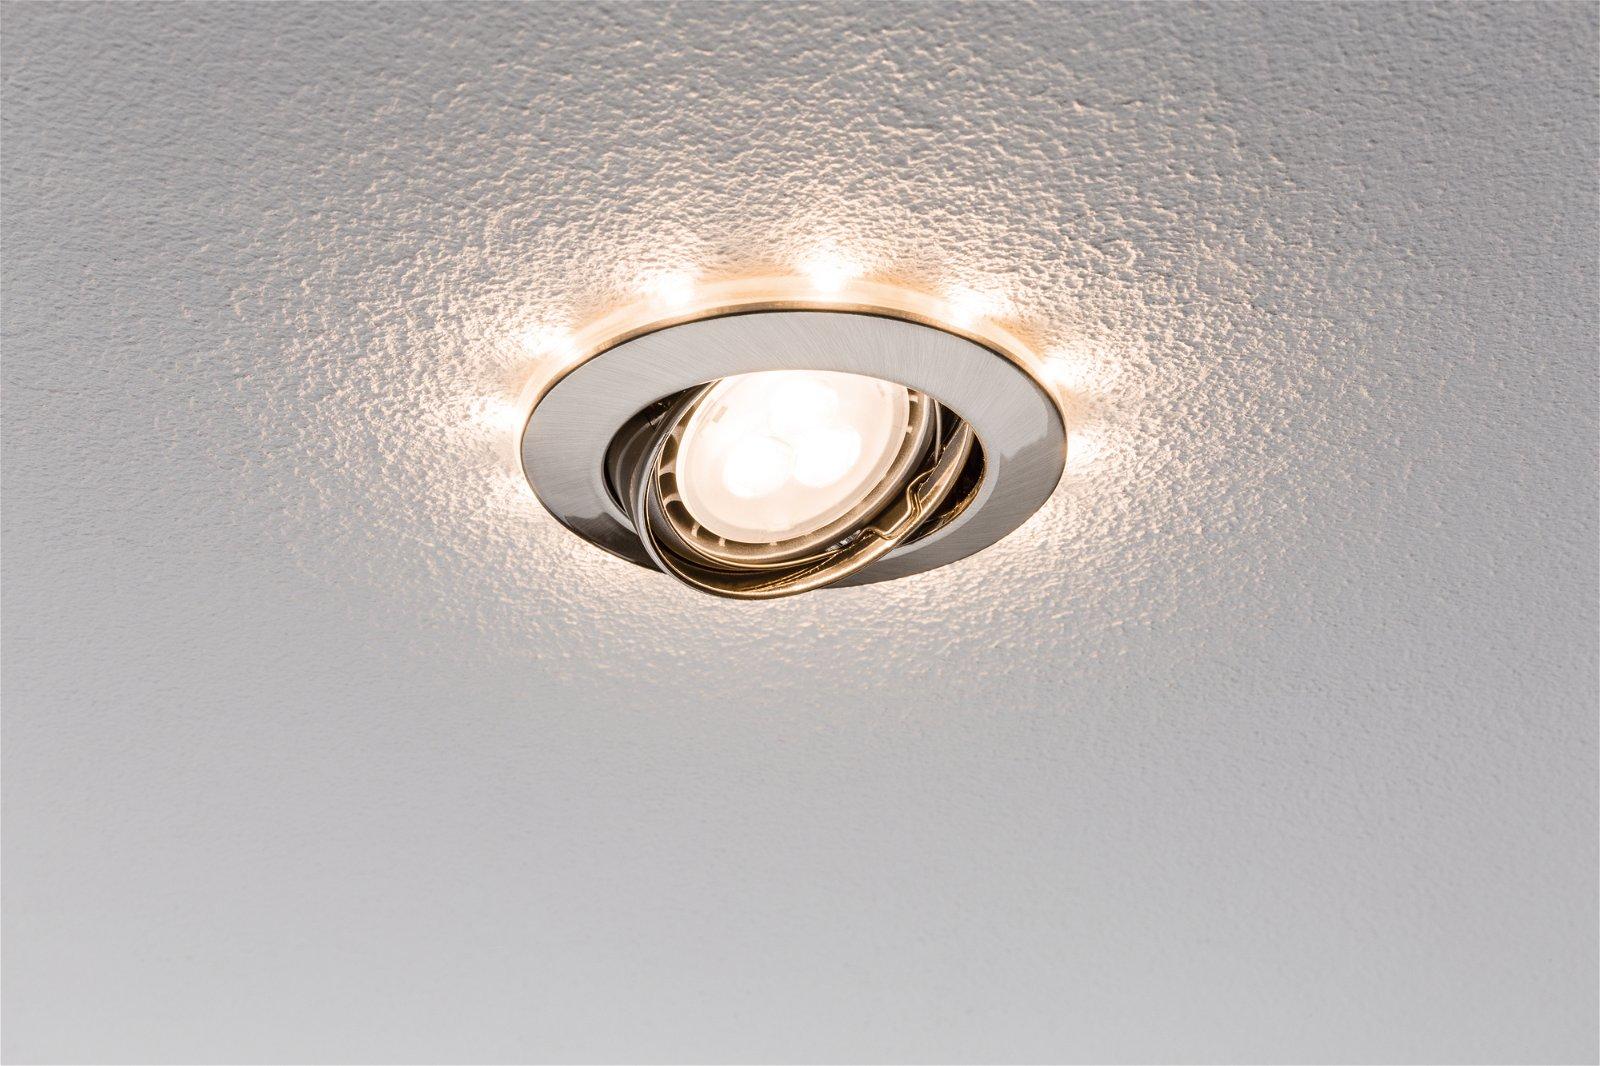 Einbauleuchten-Set LED mit Sternenhimmel LED Eisen gebürstet, 3er Set